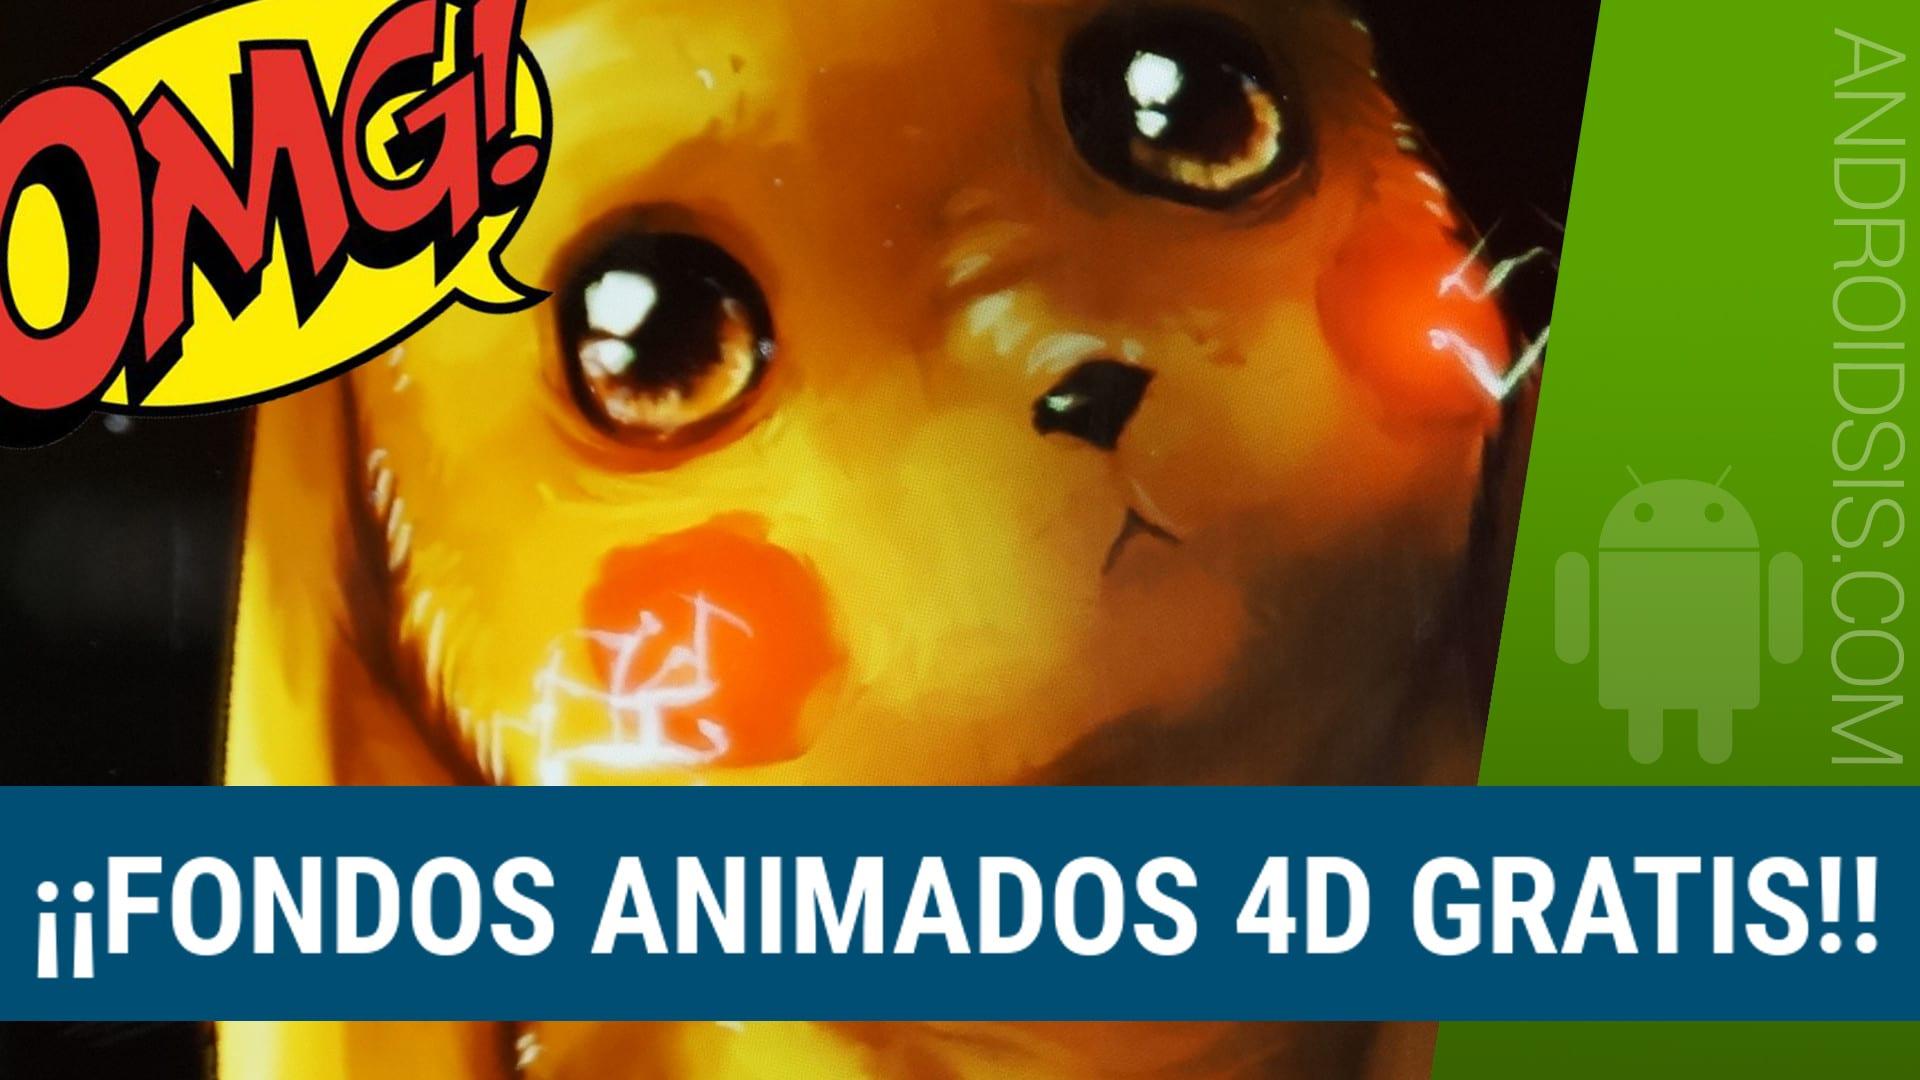 Los mejores Wallpapers 4D gratis para tu Android